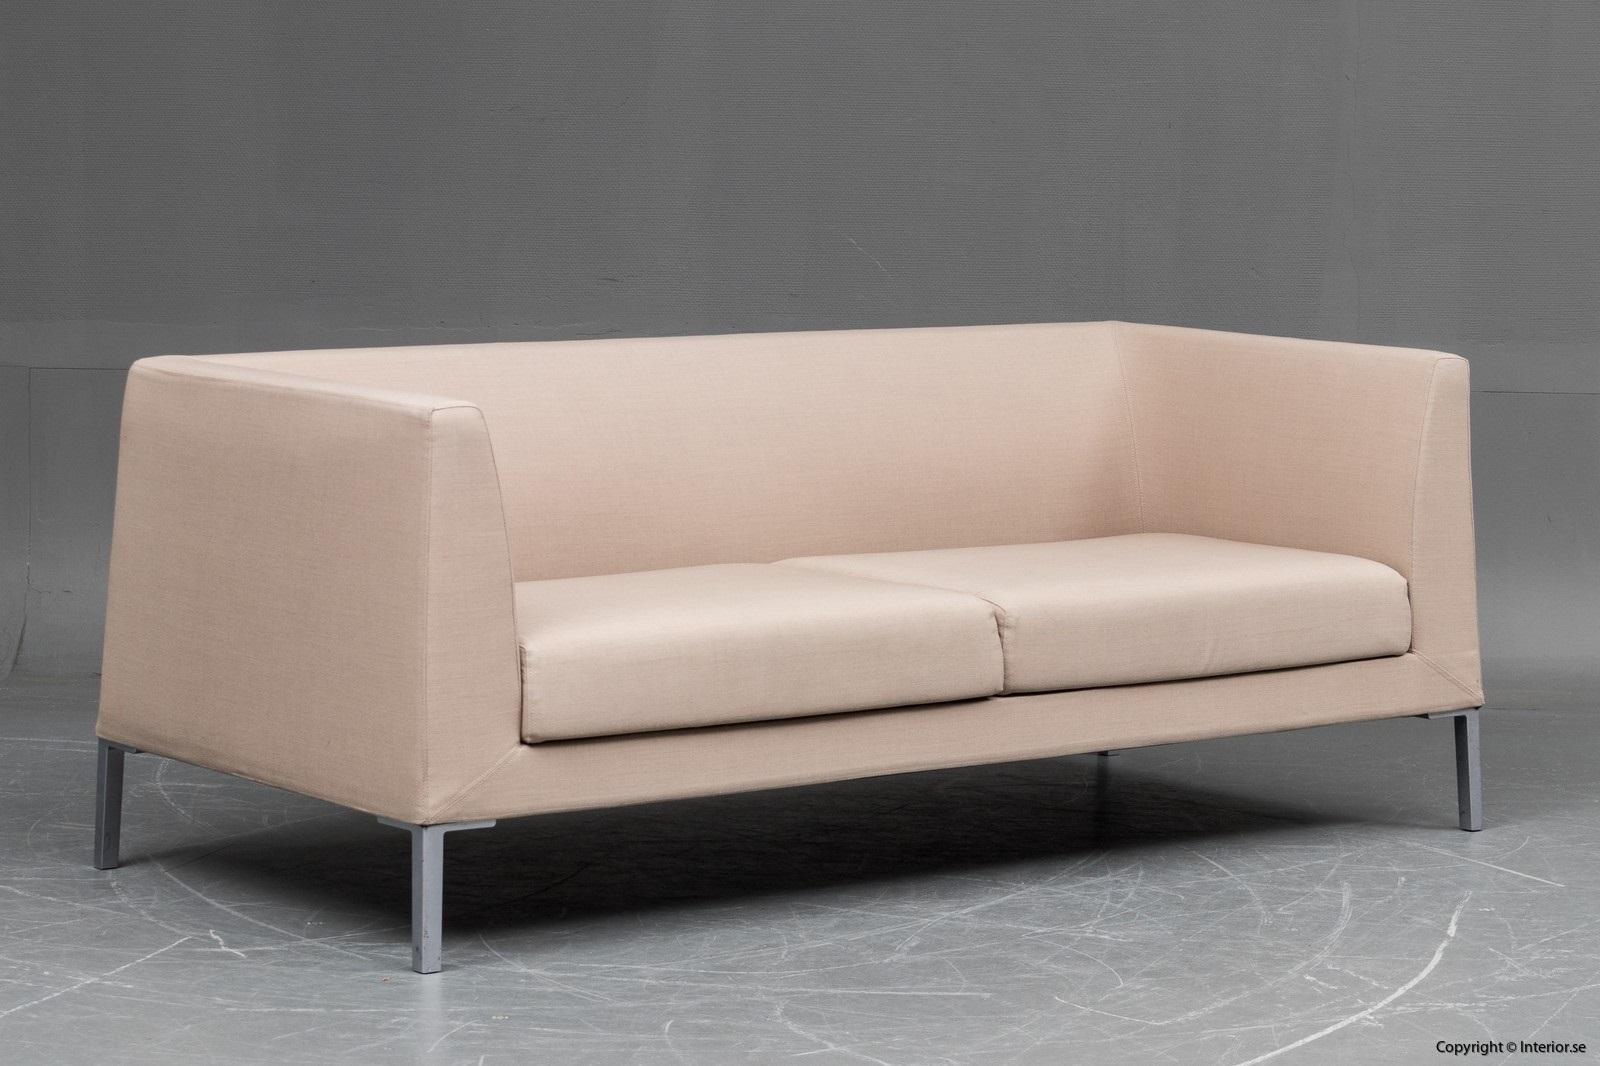 1 2-sits soffa, Paustian Eilersen Lounge - Hiorth Lorenzen & Foersom